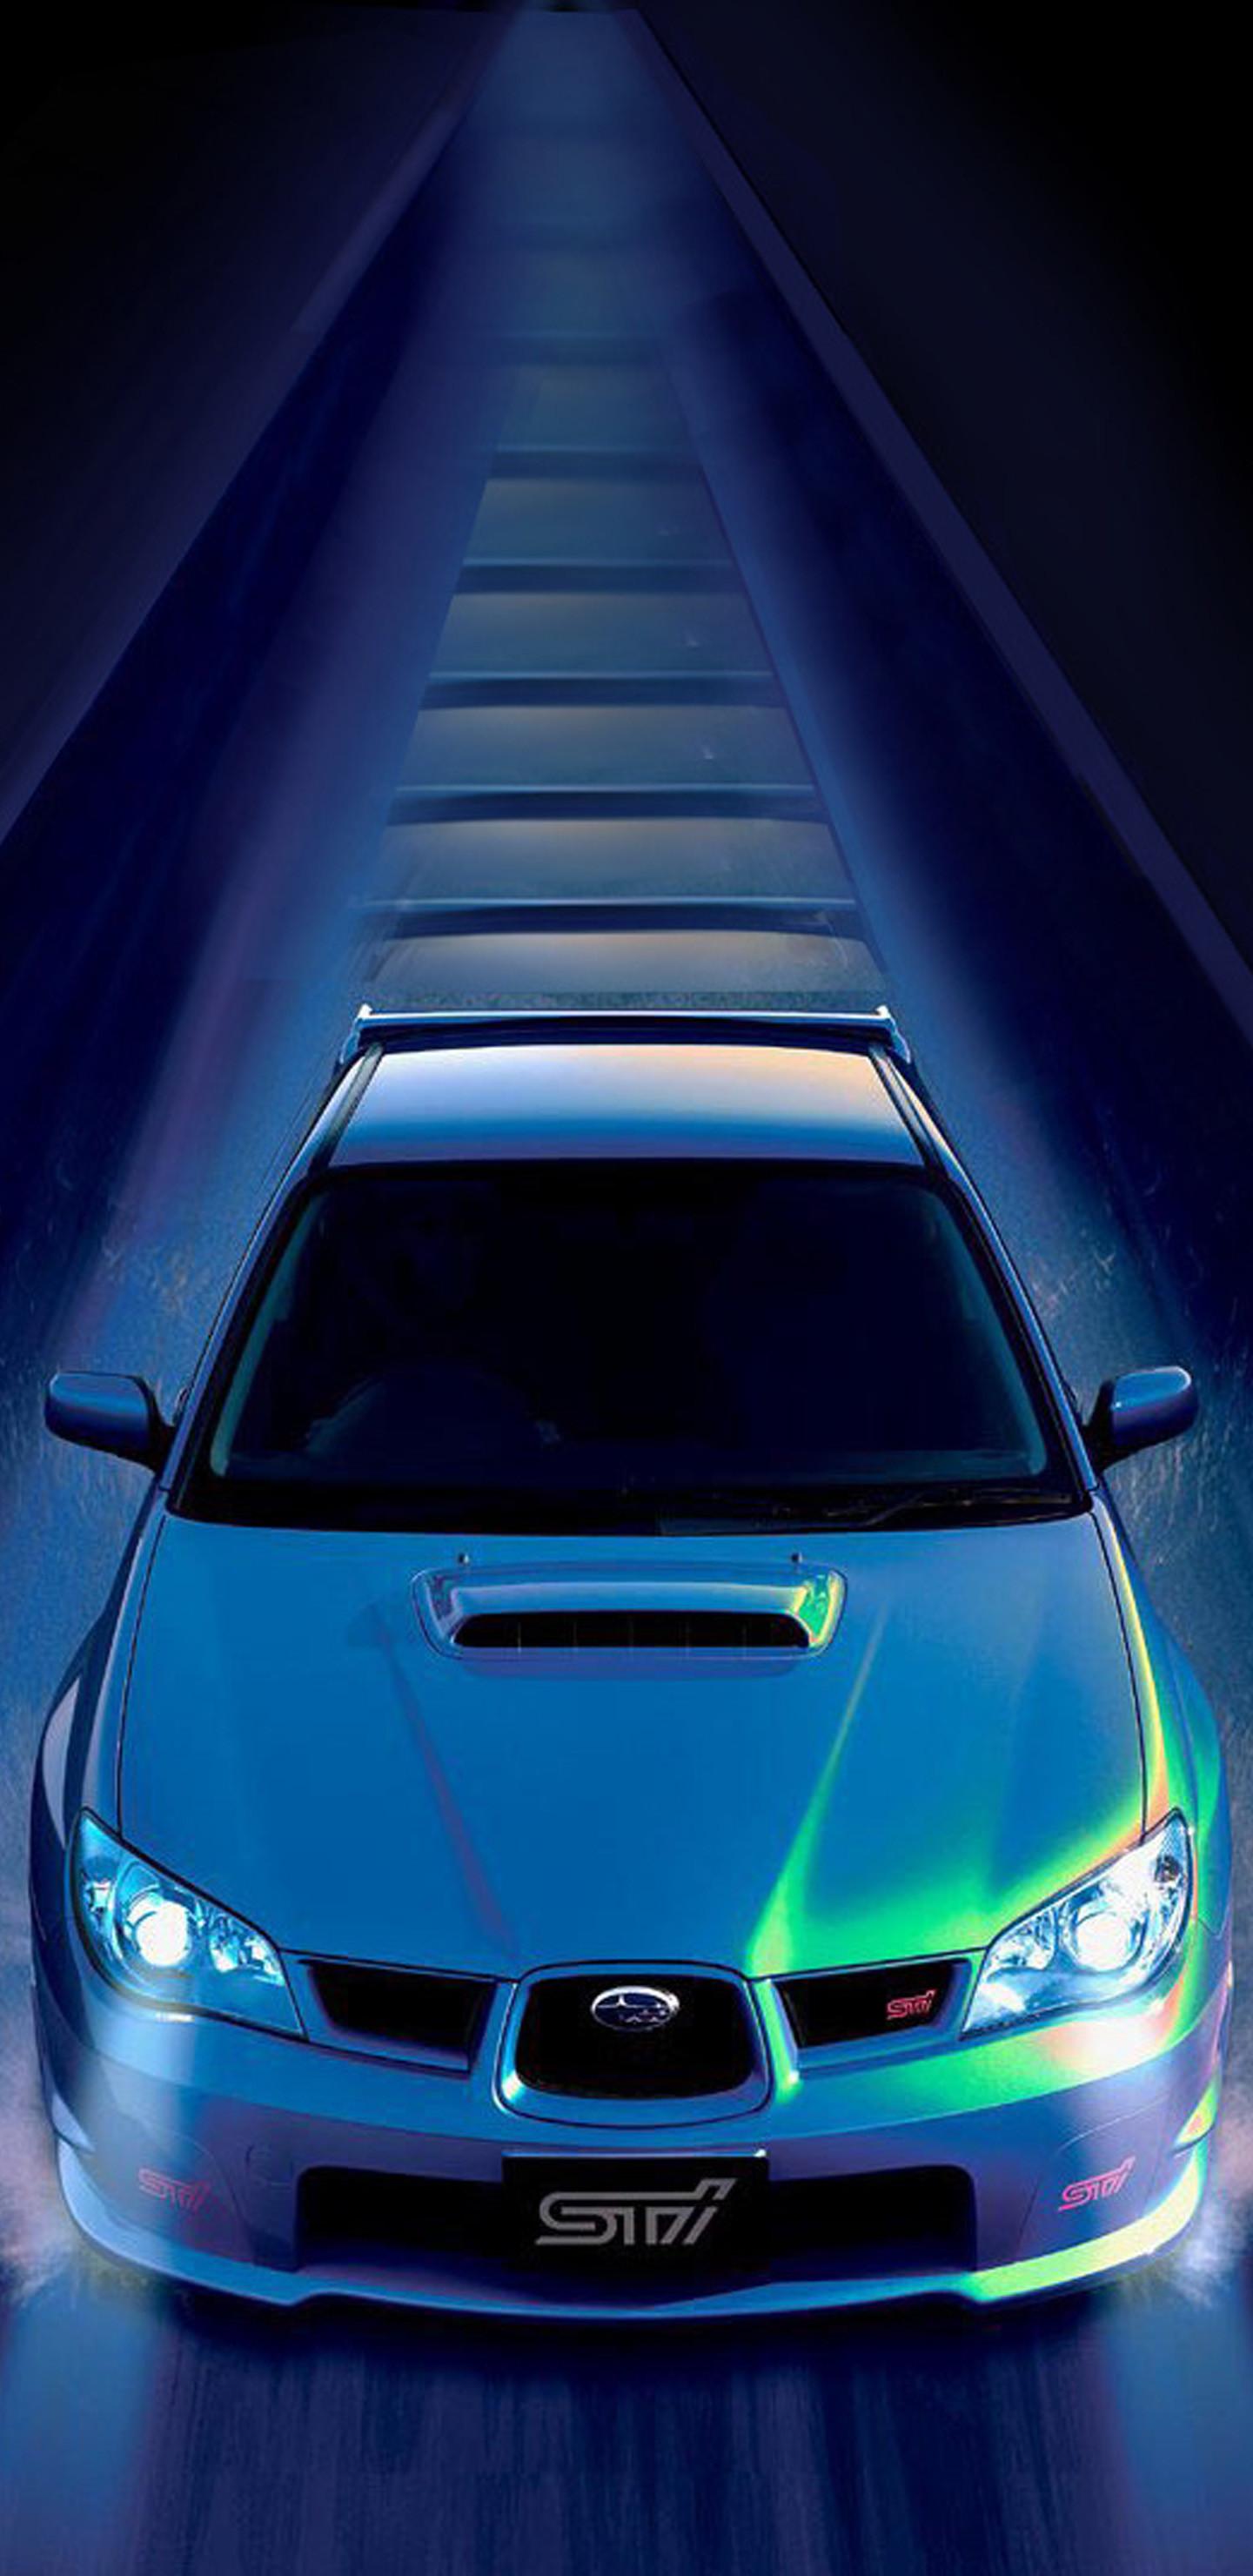 Res: 1440x2960, Subaru Classic STI Galaxy S8 Wallpapers